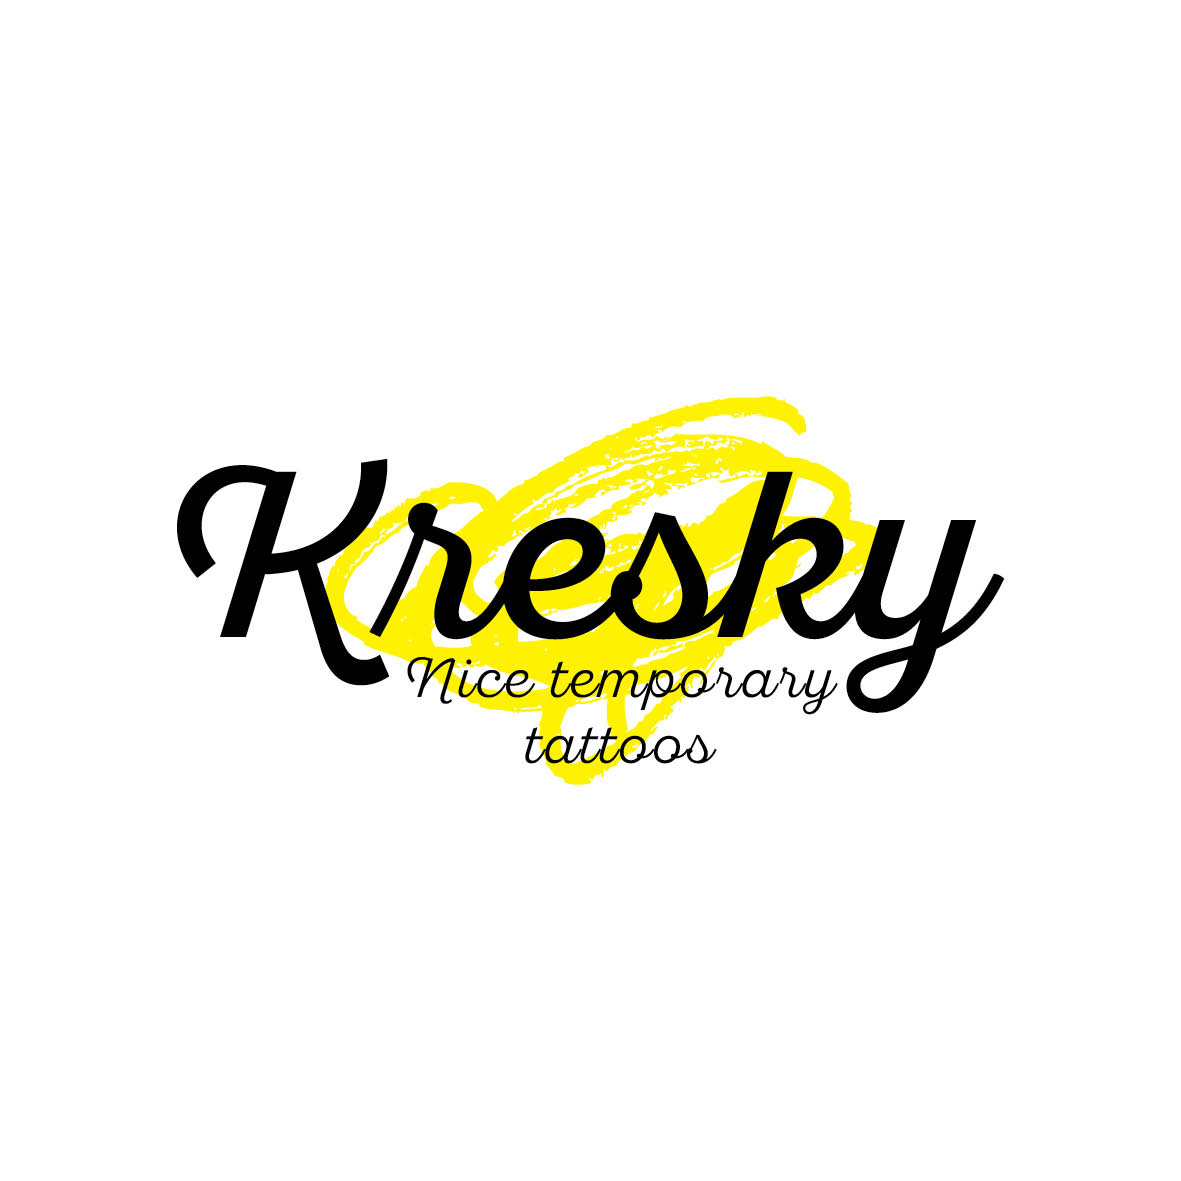 Kresky